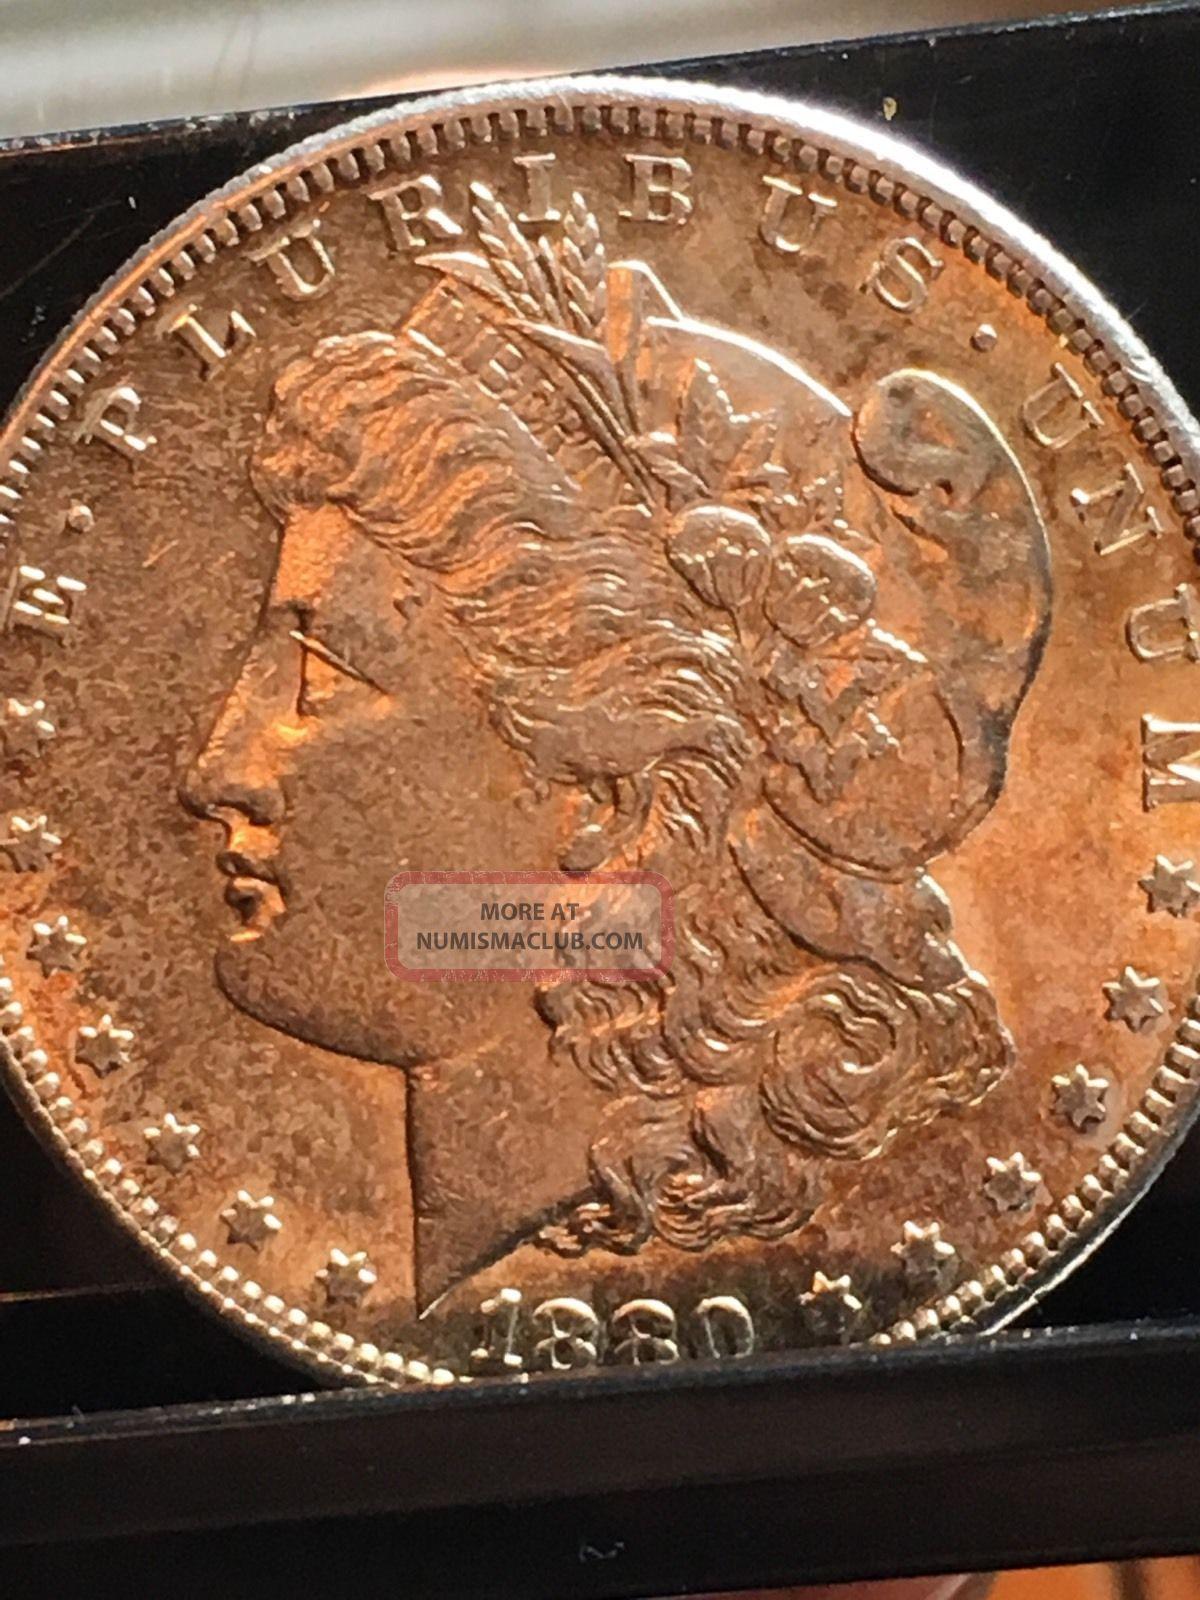 Morgan Dollar Bu 1880 S Pl,  Obverse Toning Good Looking Coin 1 Day Dollars photo